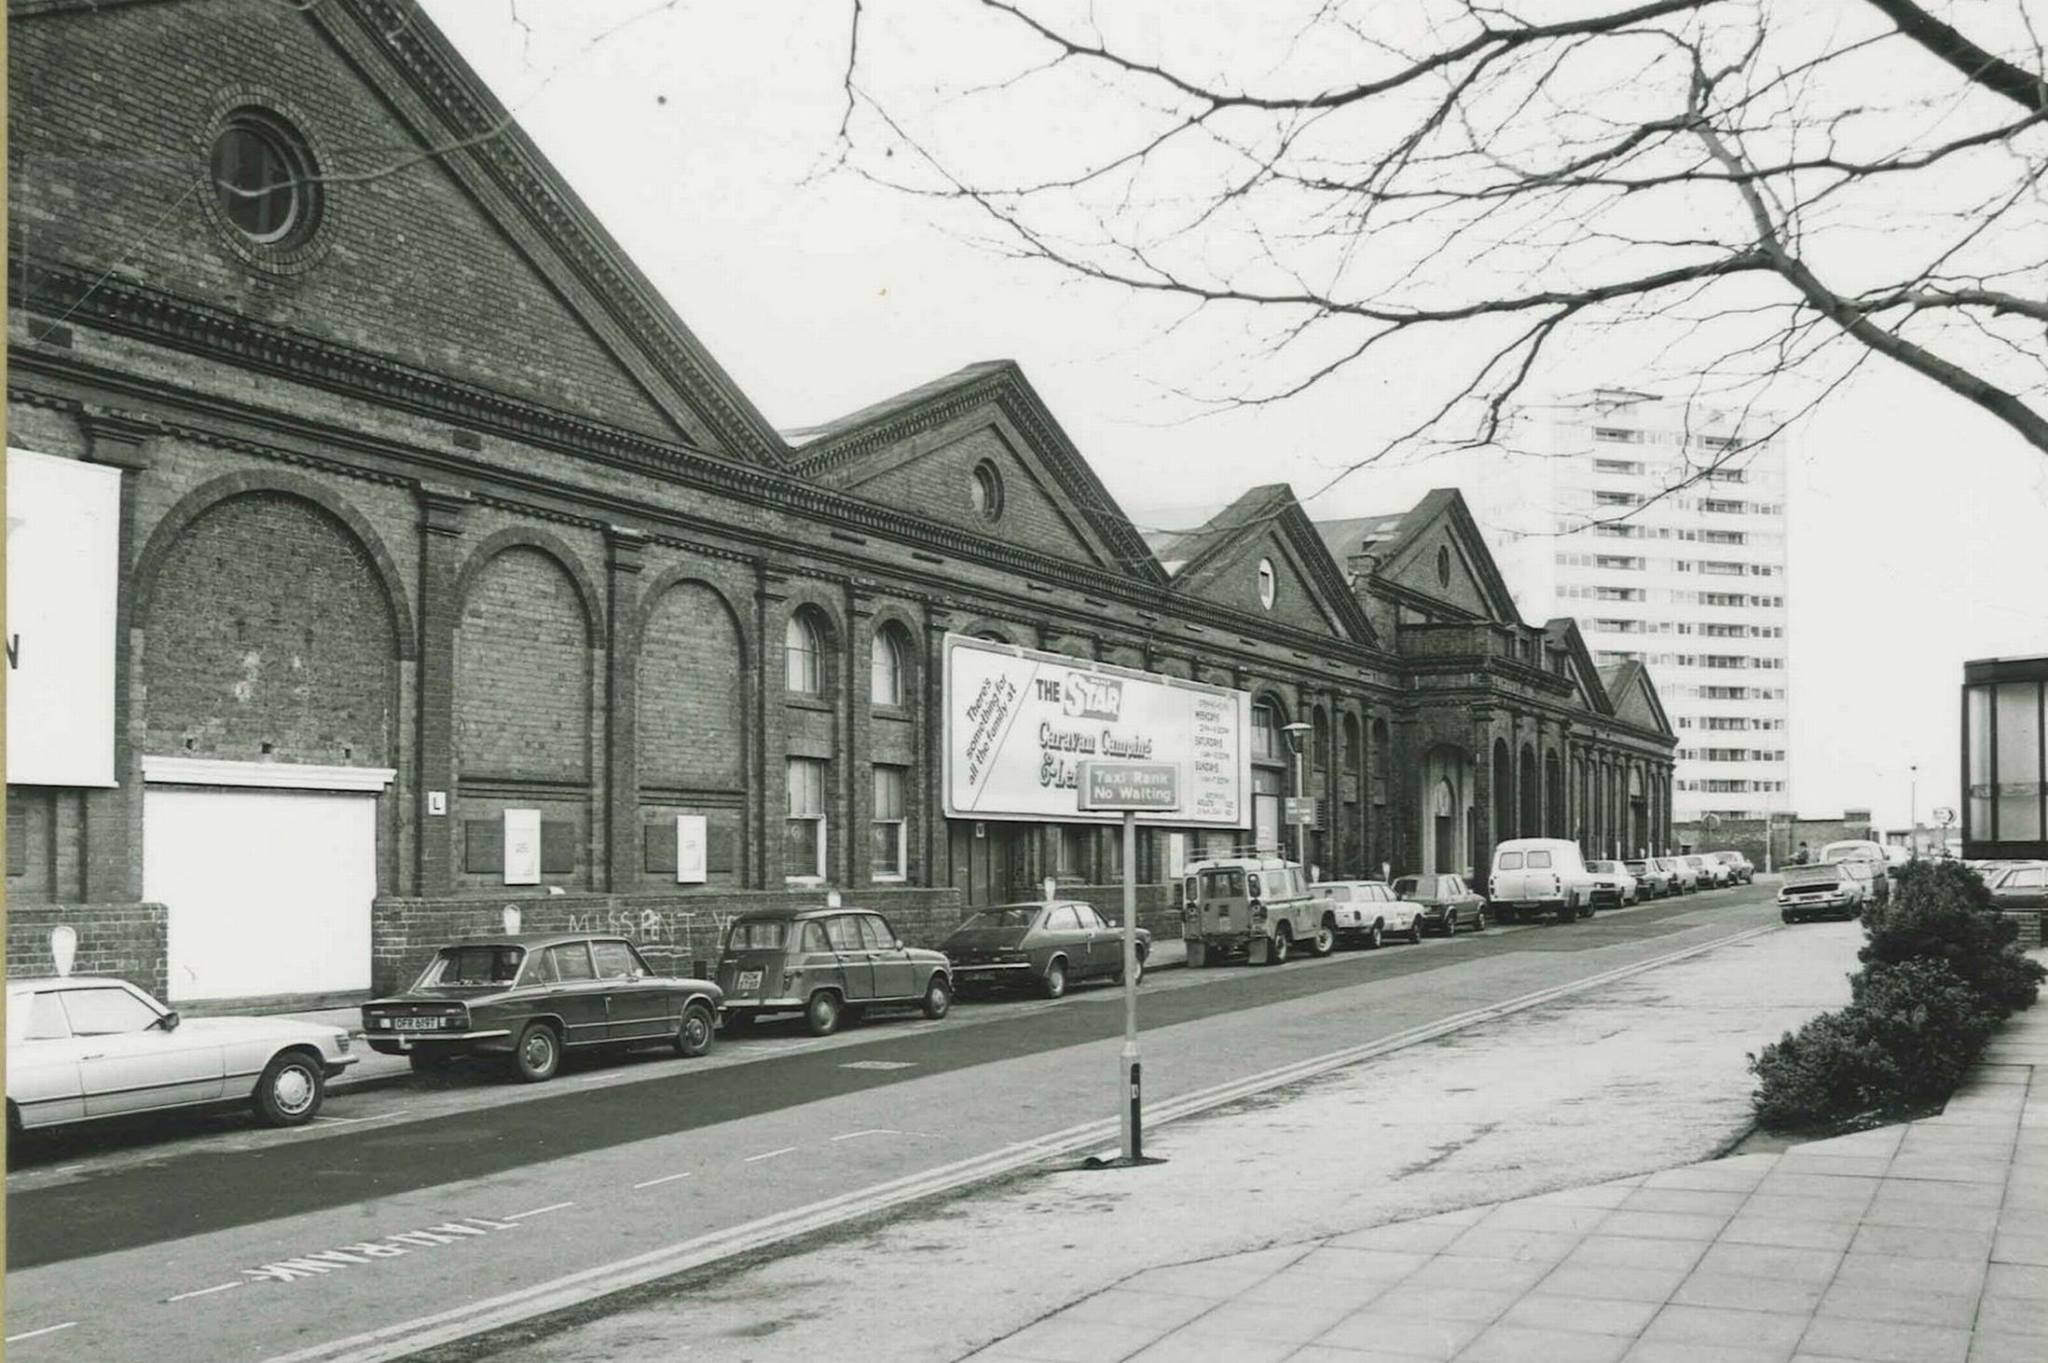 Bingley Hall Birmingham Music Archive